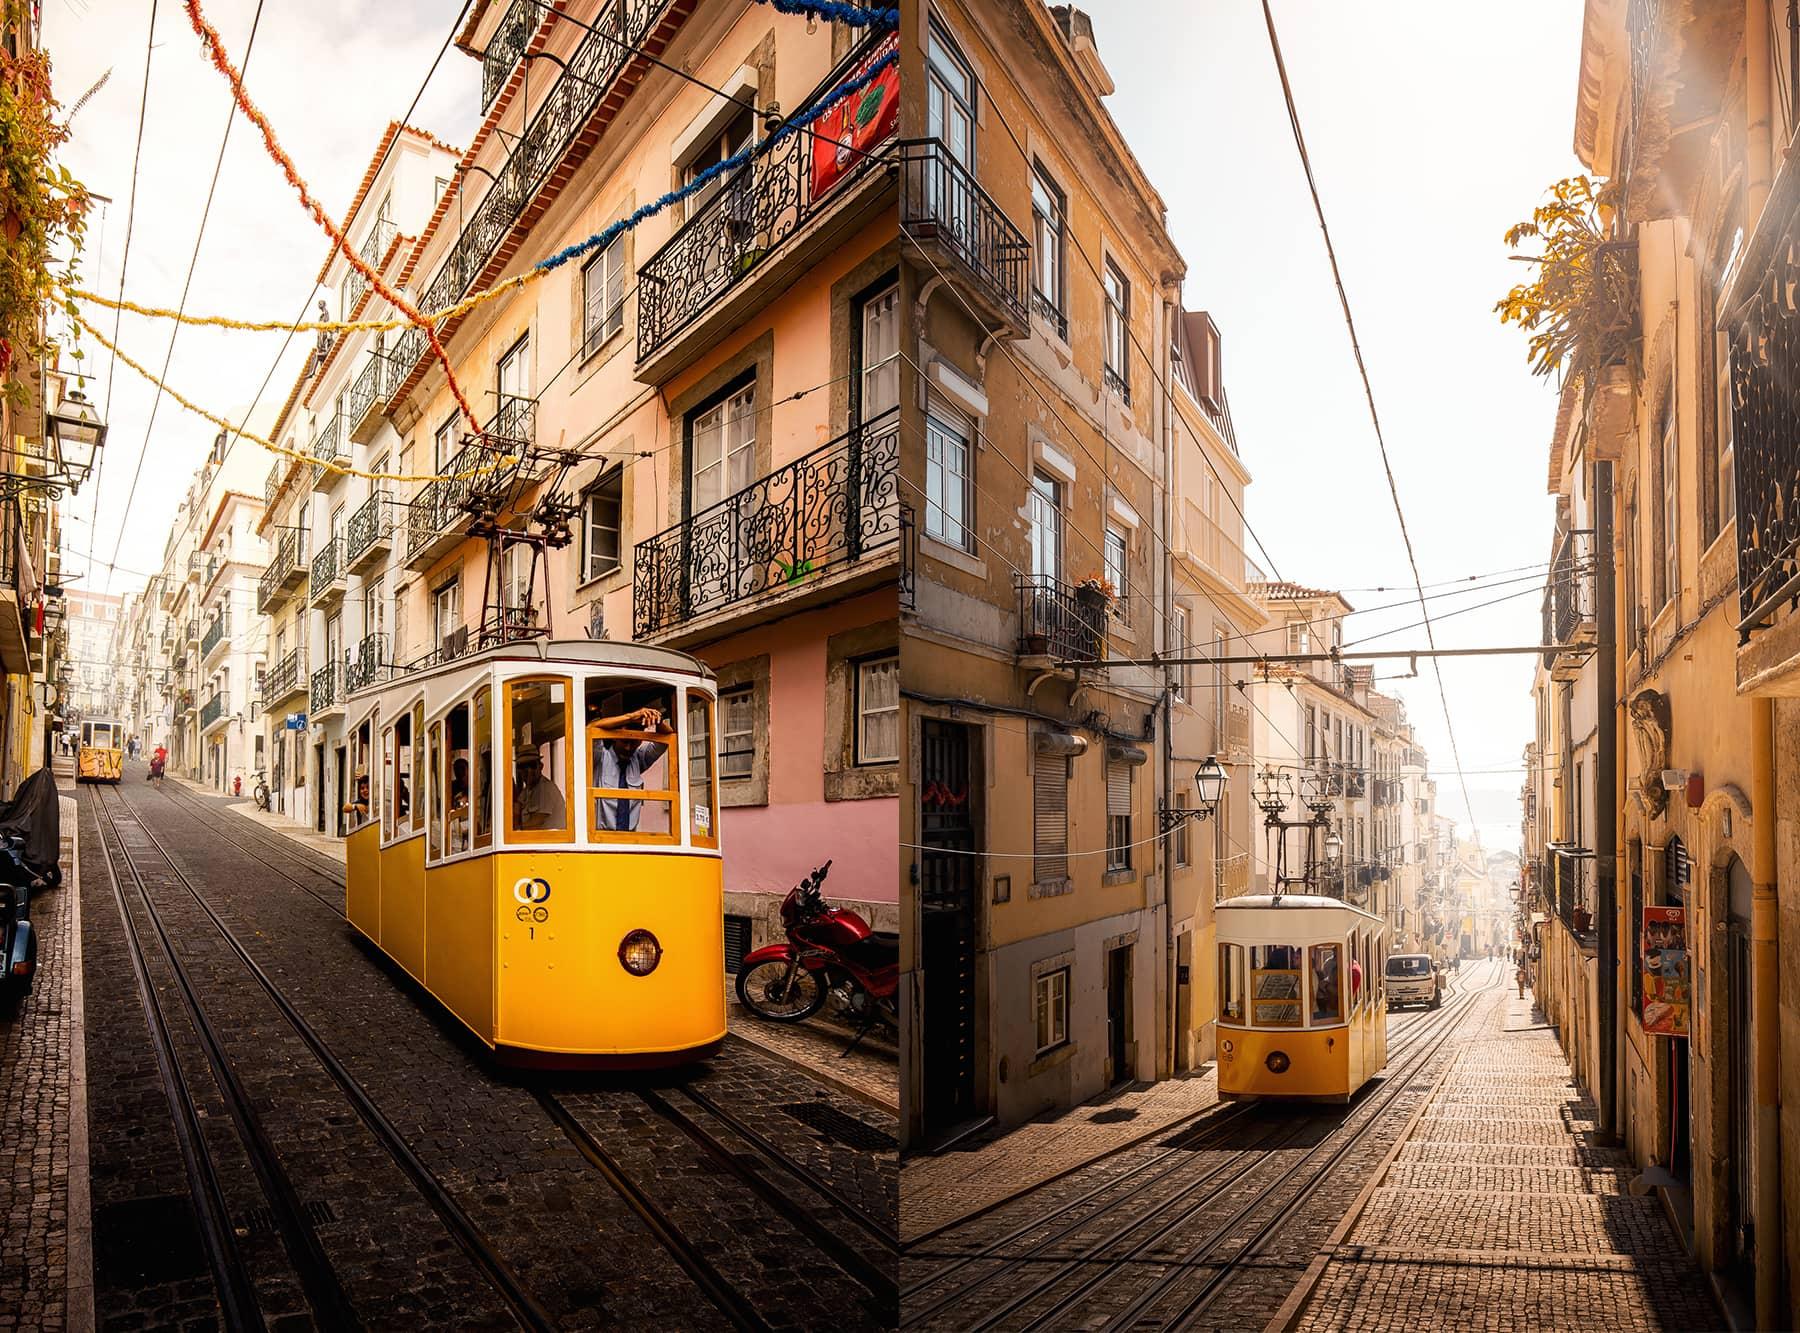 Rua da Bica de Duarte Belo mit den berühmten Lissaboner Straßenbahnen